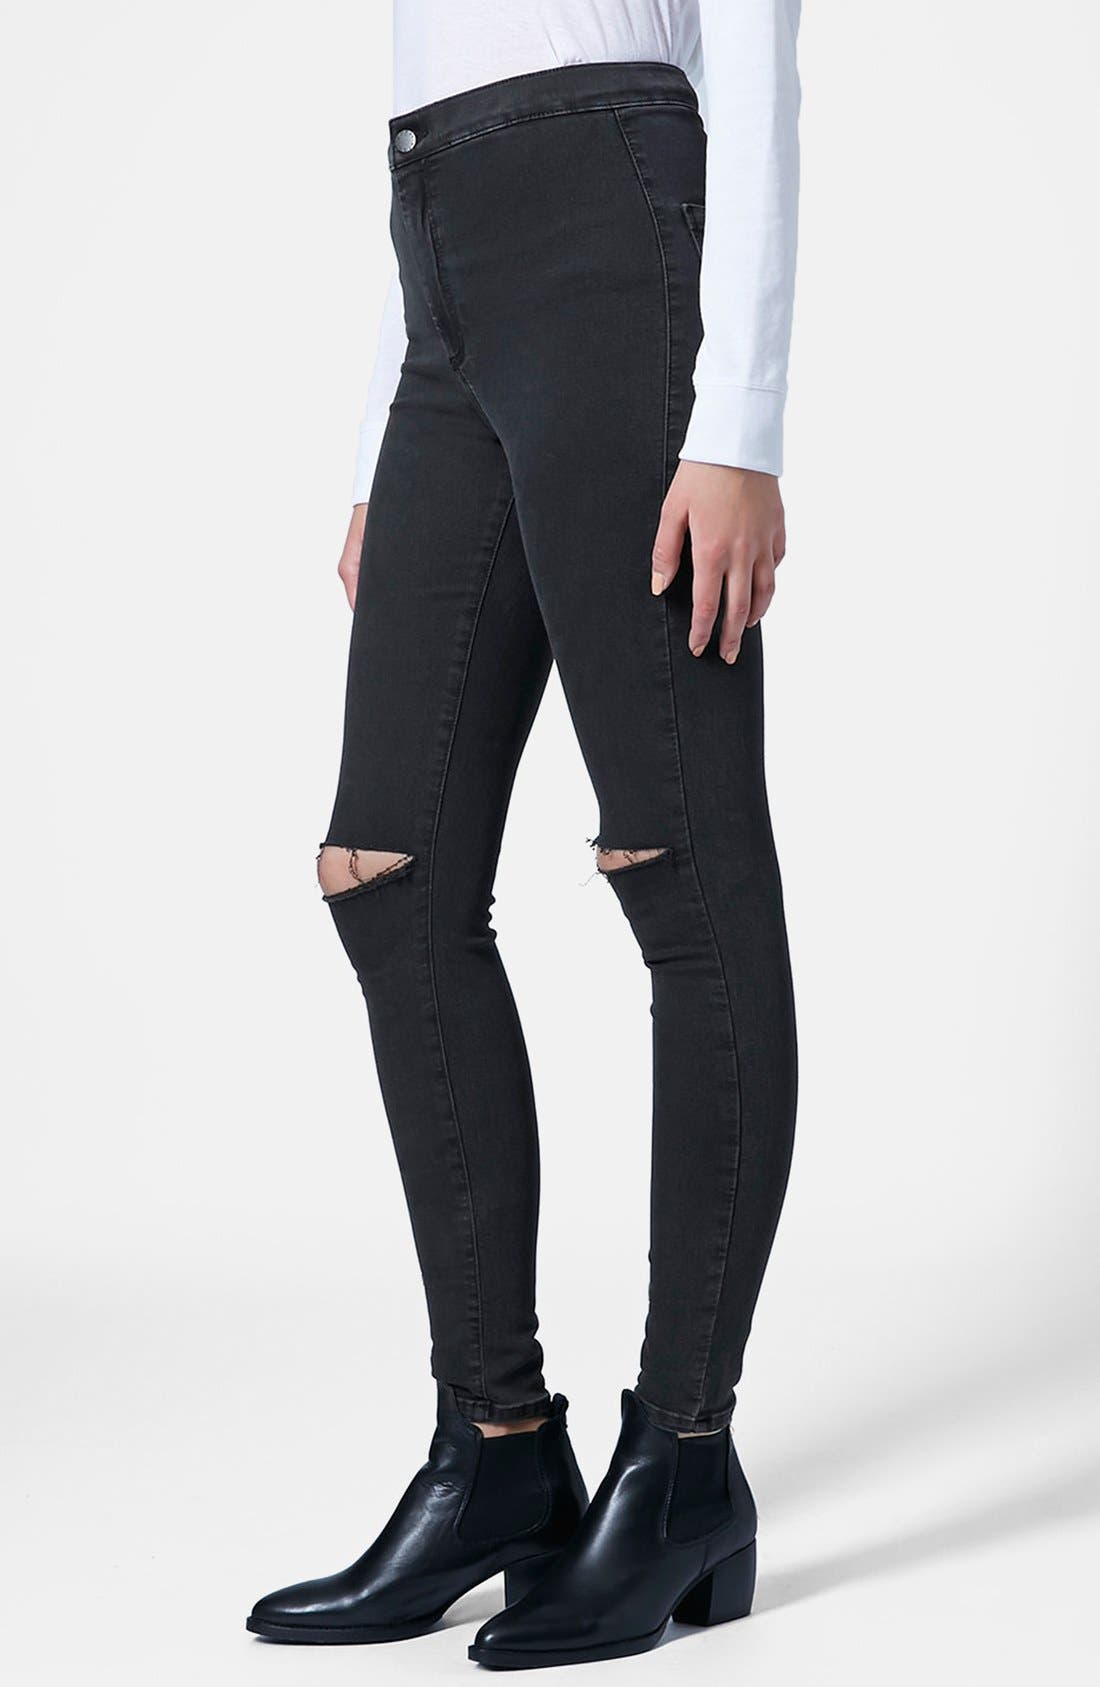 Main Image - Topshop 'Joni' Ripped Skinny Jeans (Black)